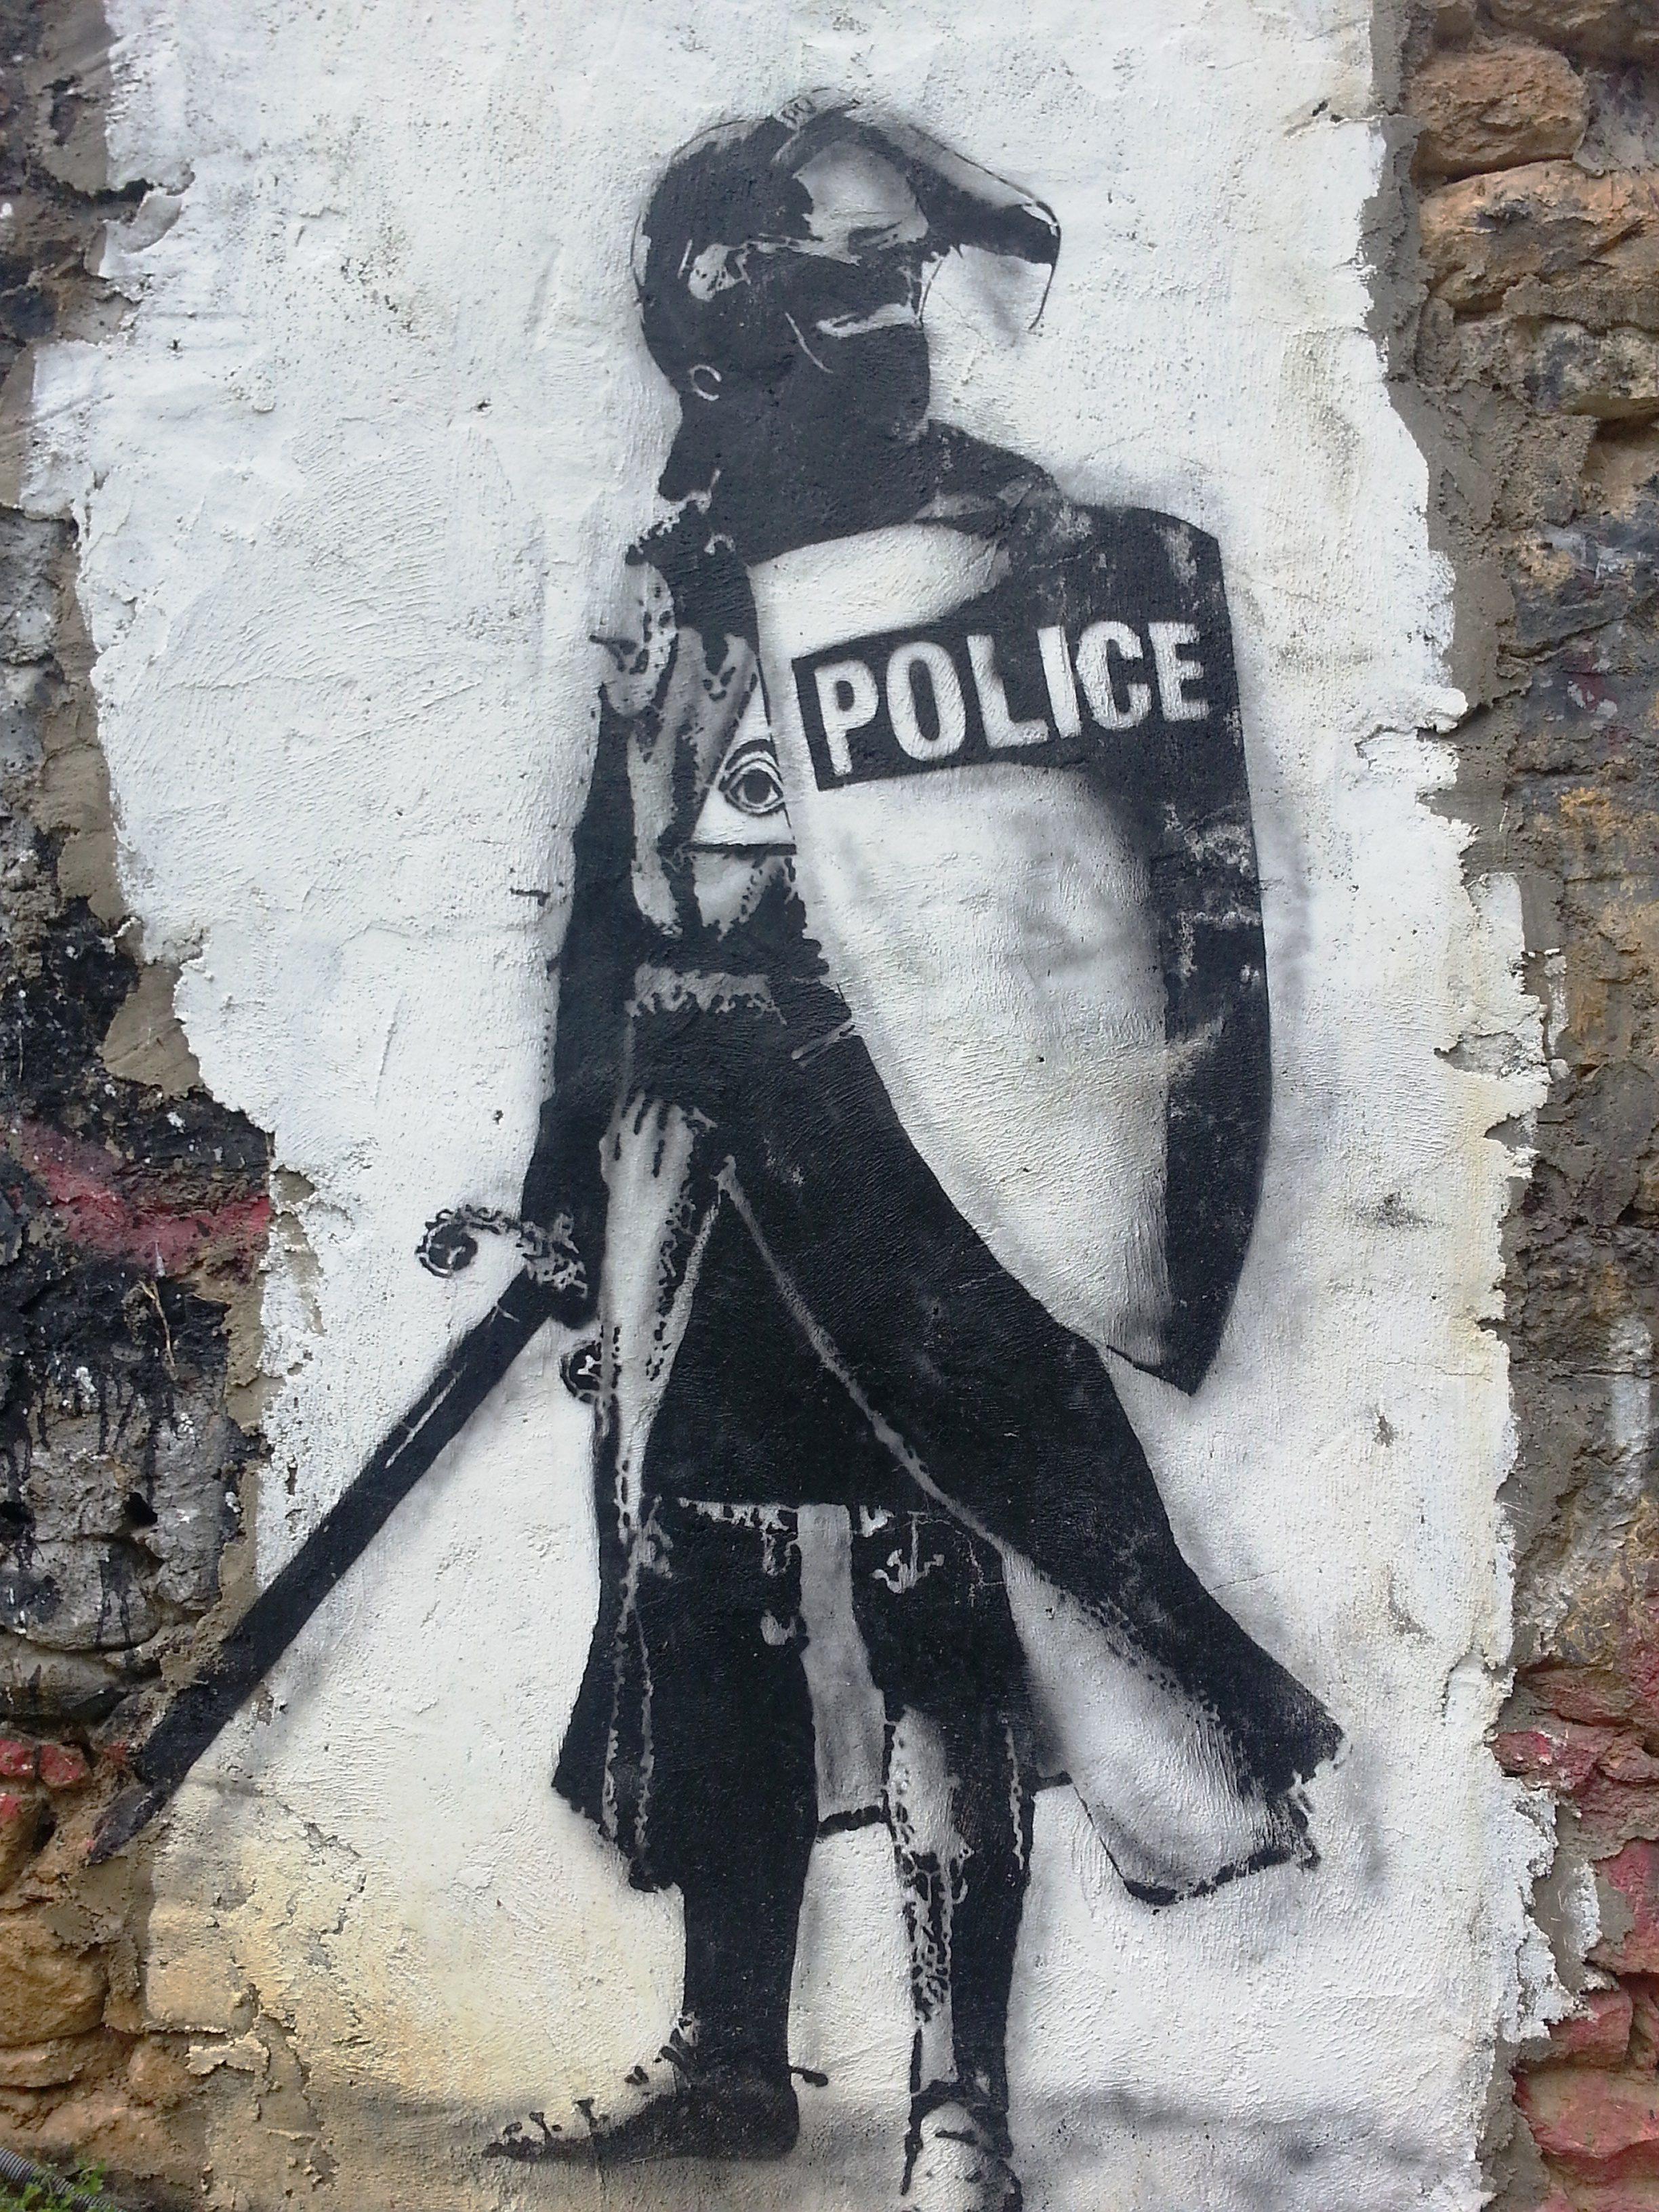 police demeure du chaos